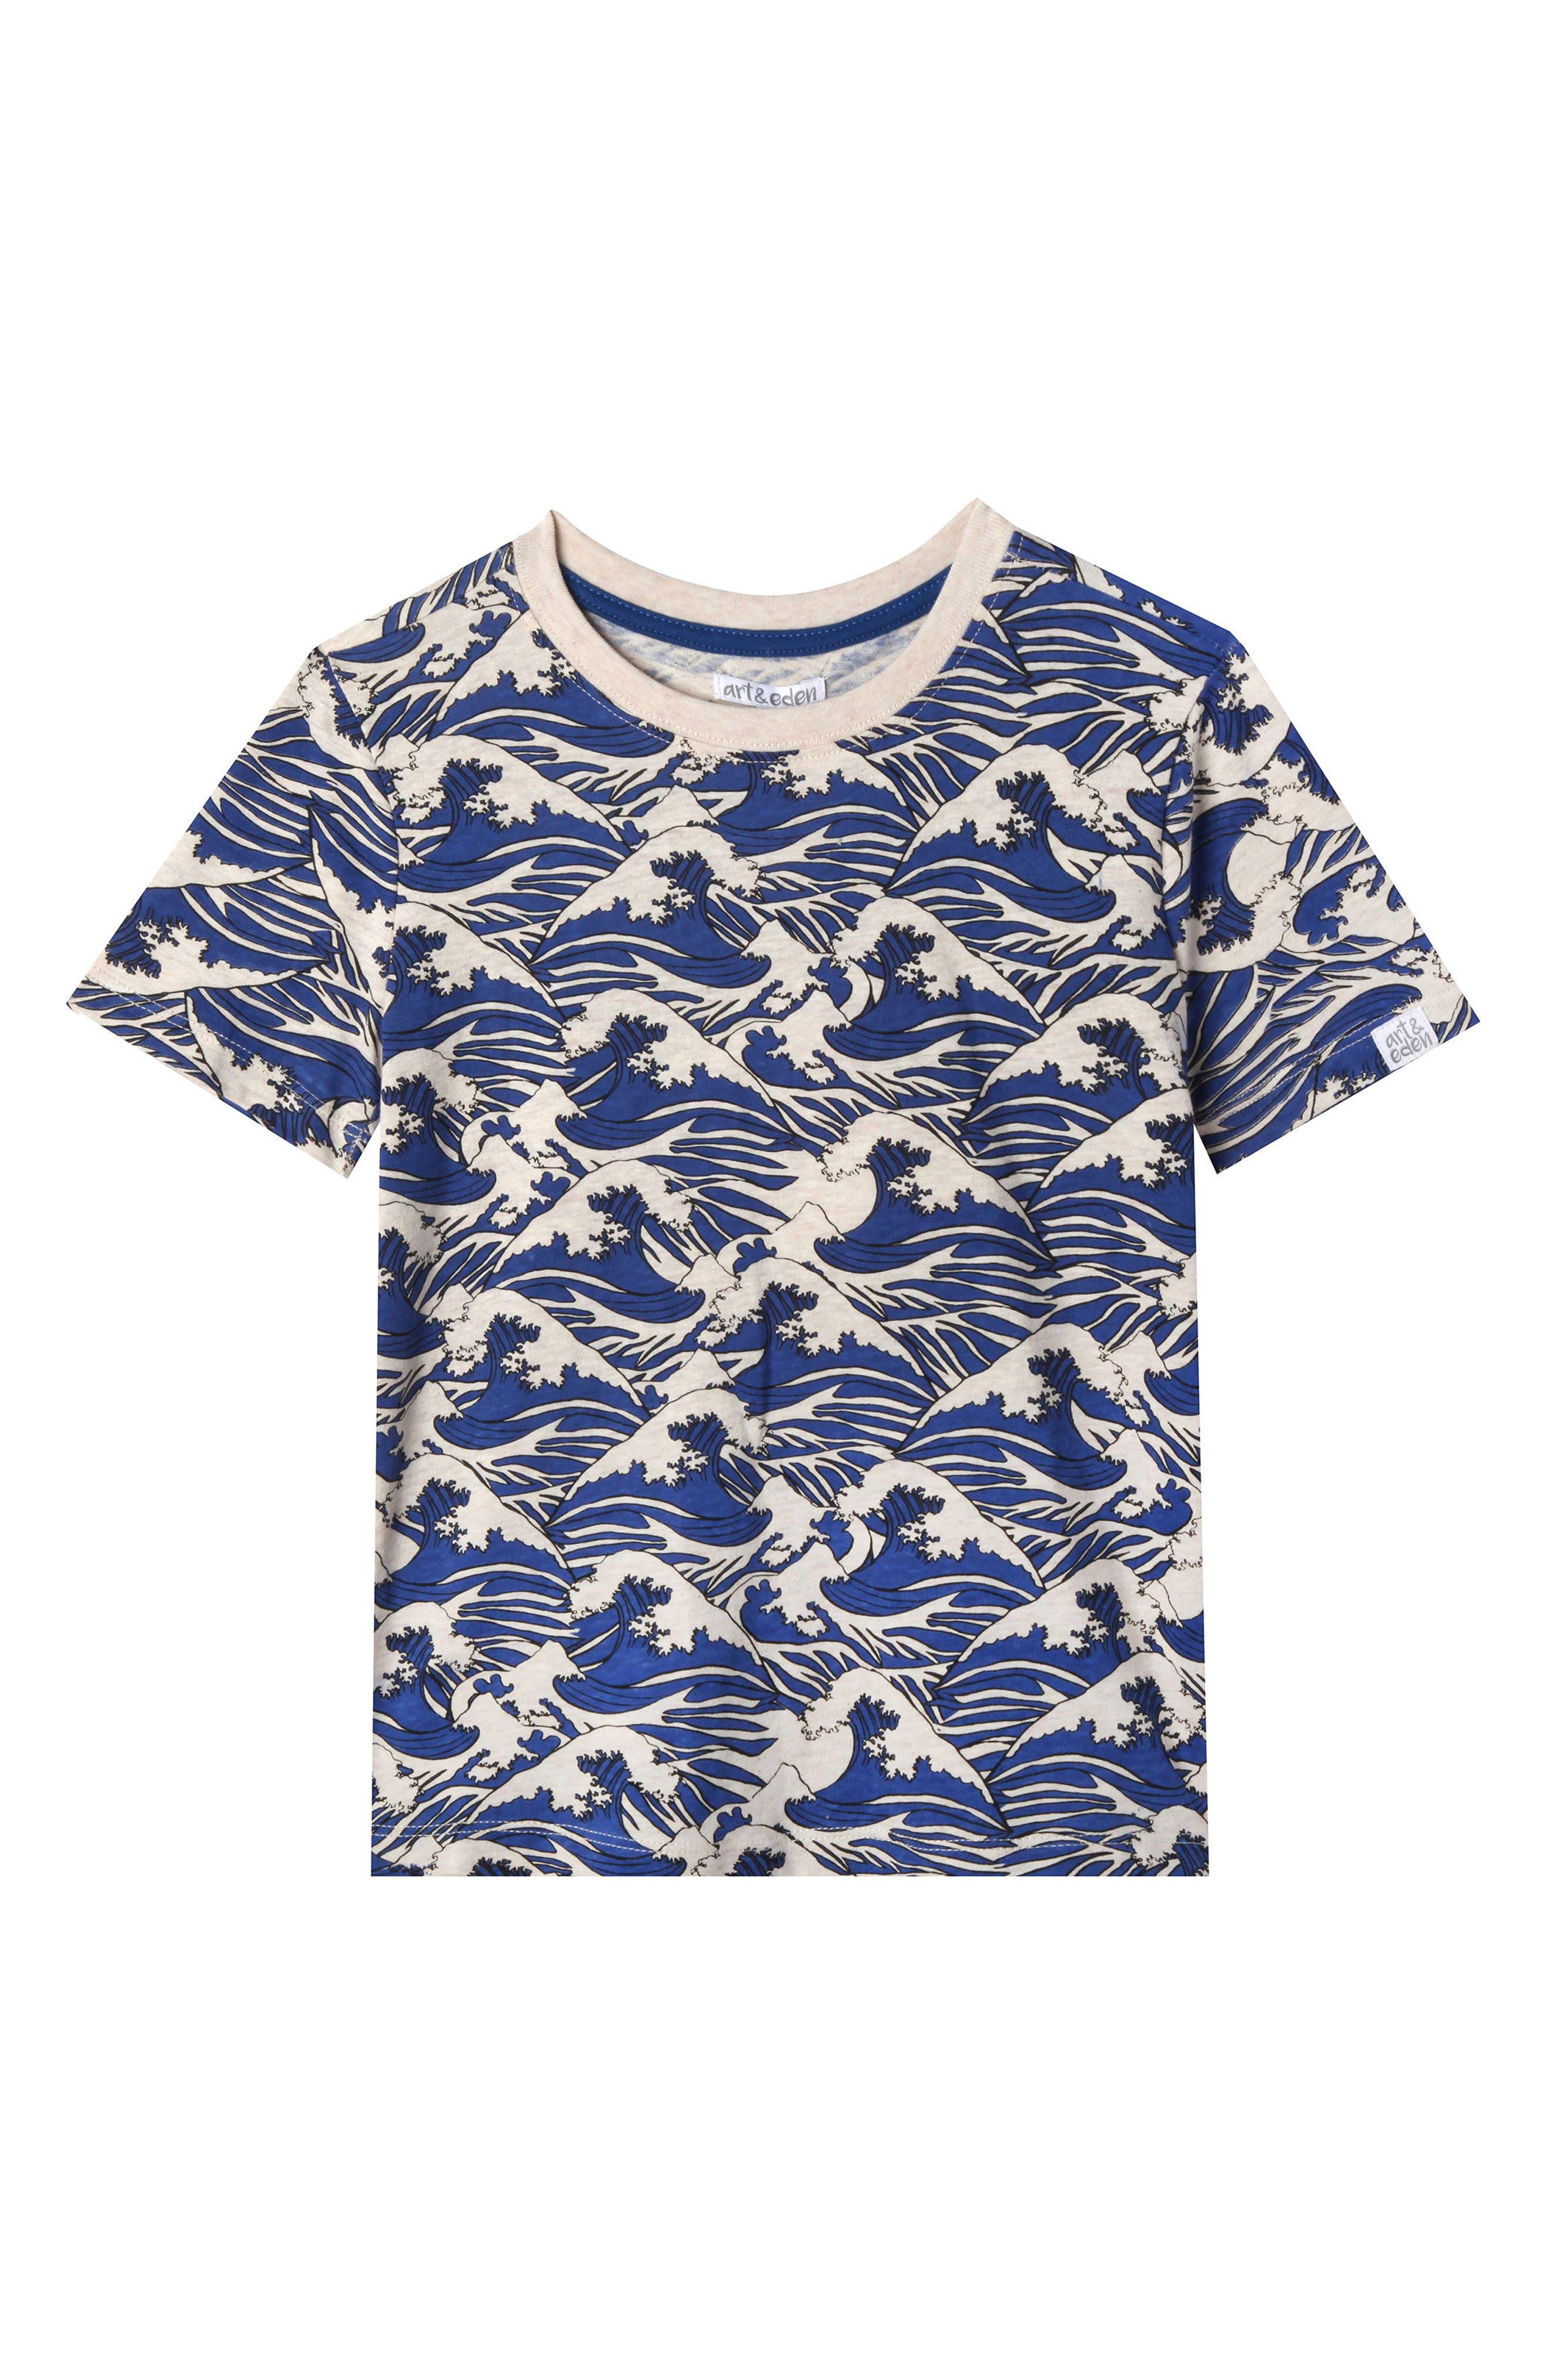 David Ocean Waves Organic Cotton T-Shirt,                         Main,                         color, Oatmeal